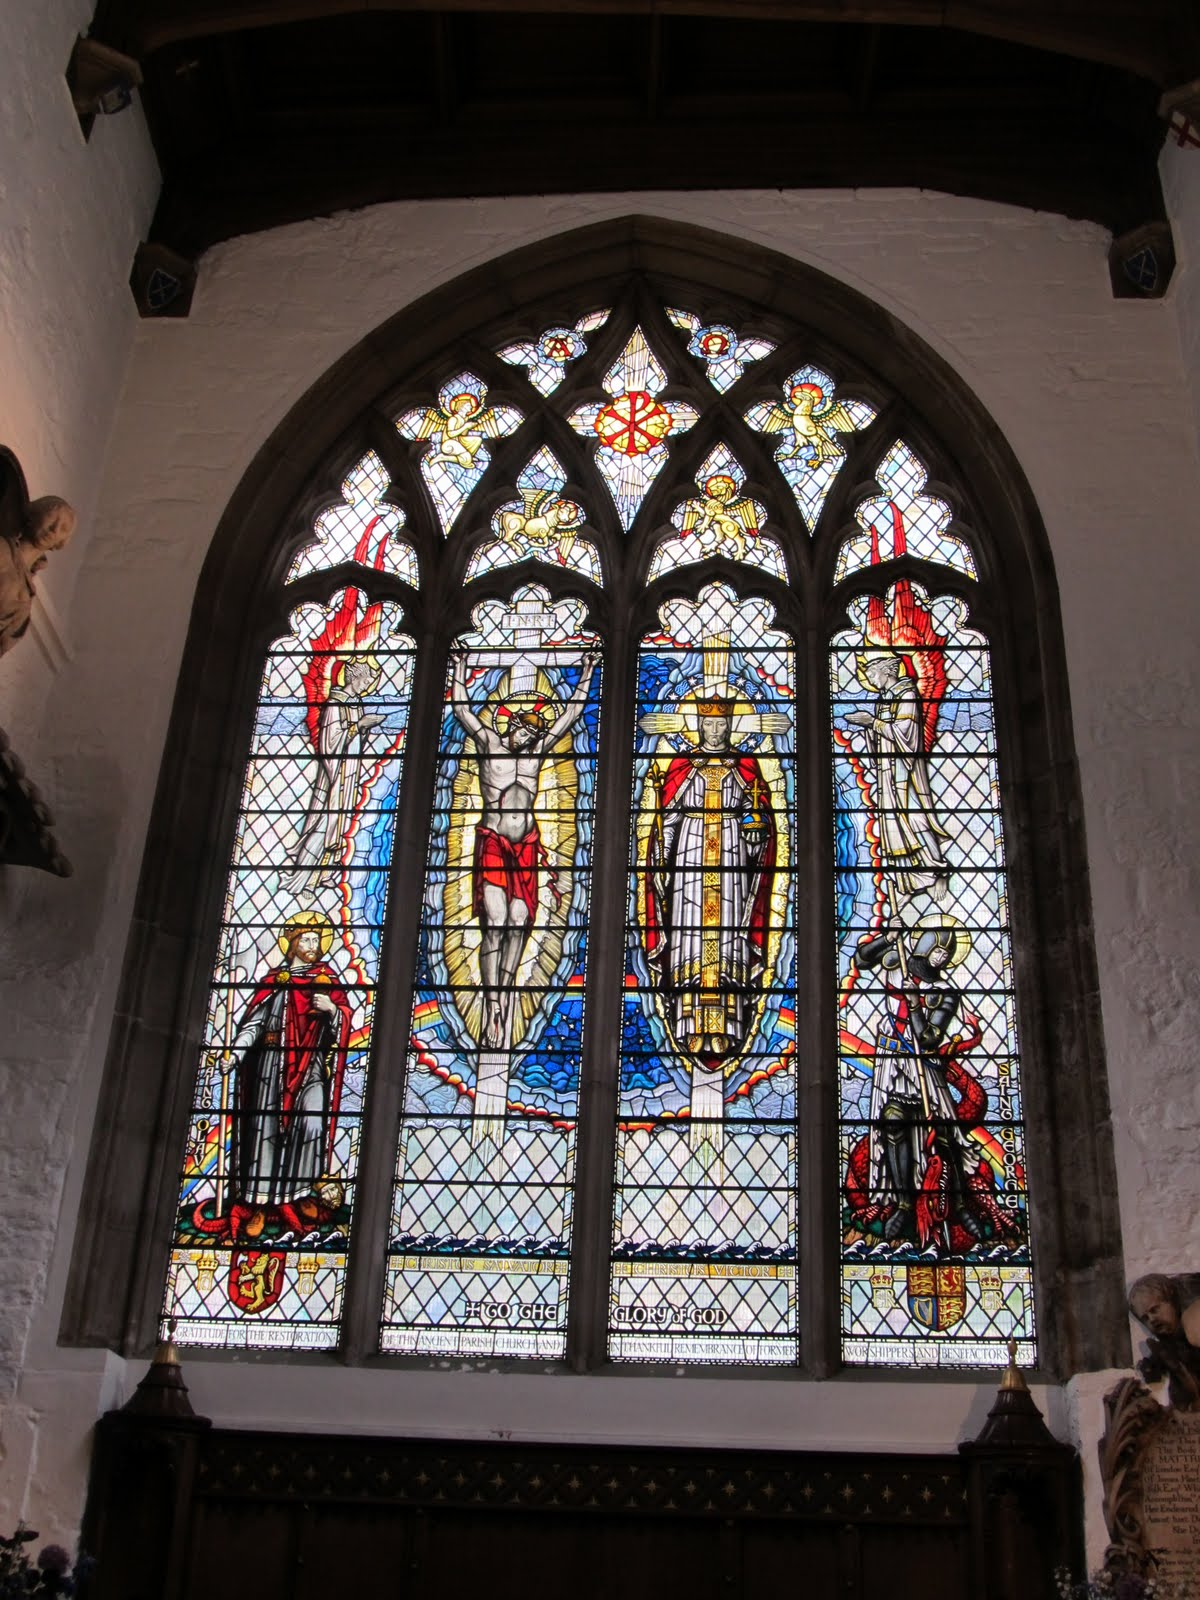 Dobbin S Churches City Of London Ii